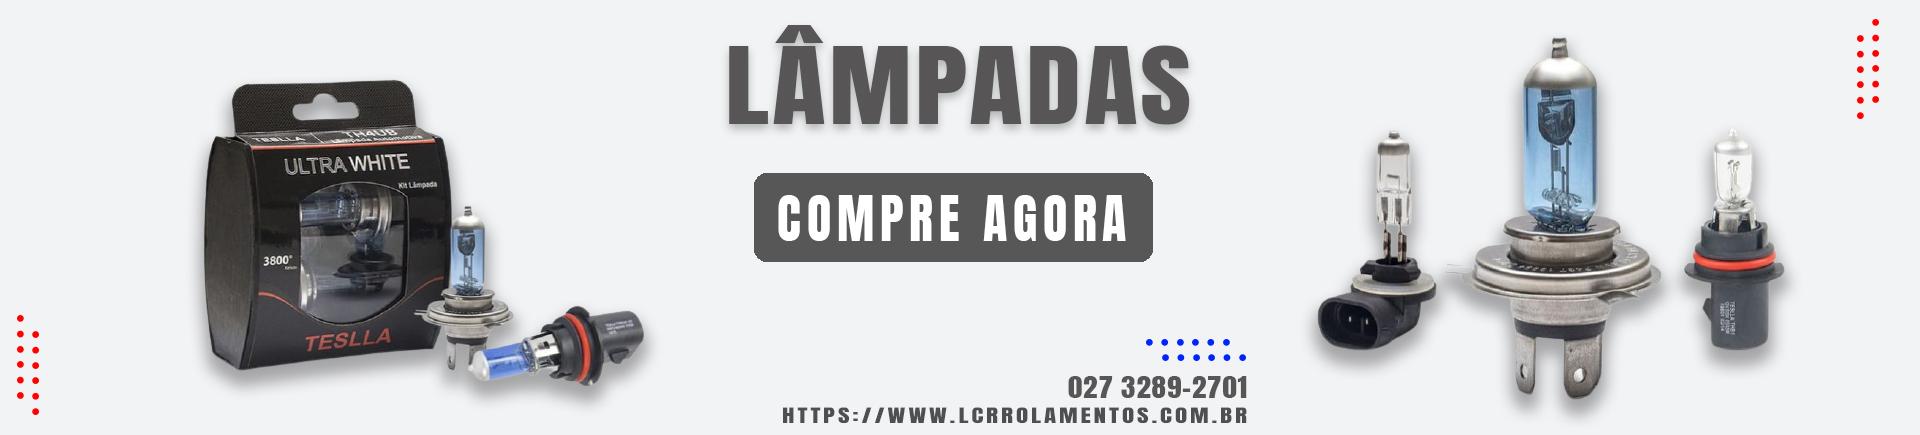 Lâmpadas_2